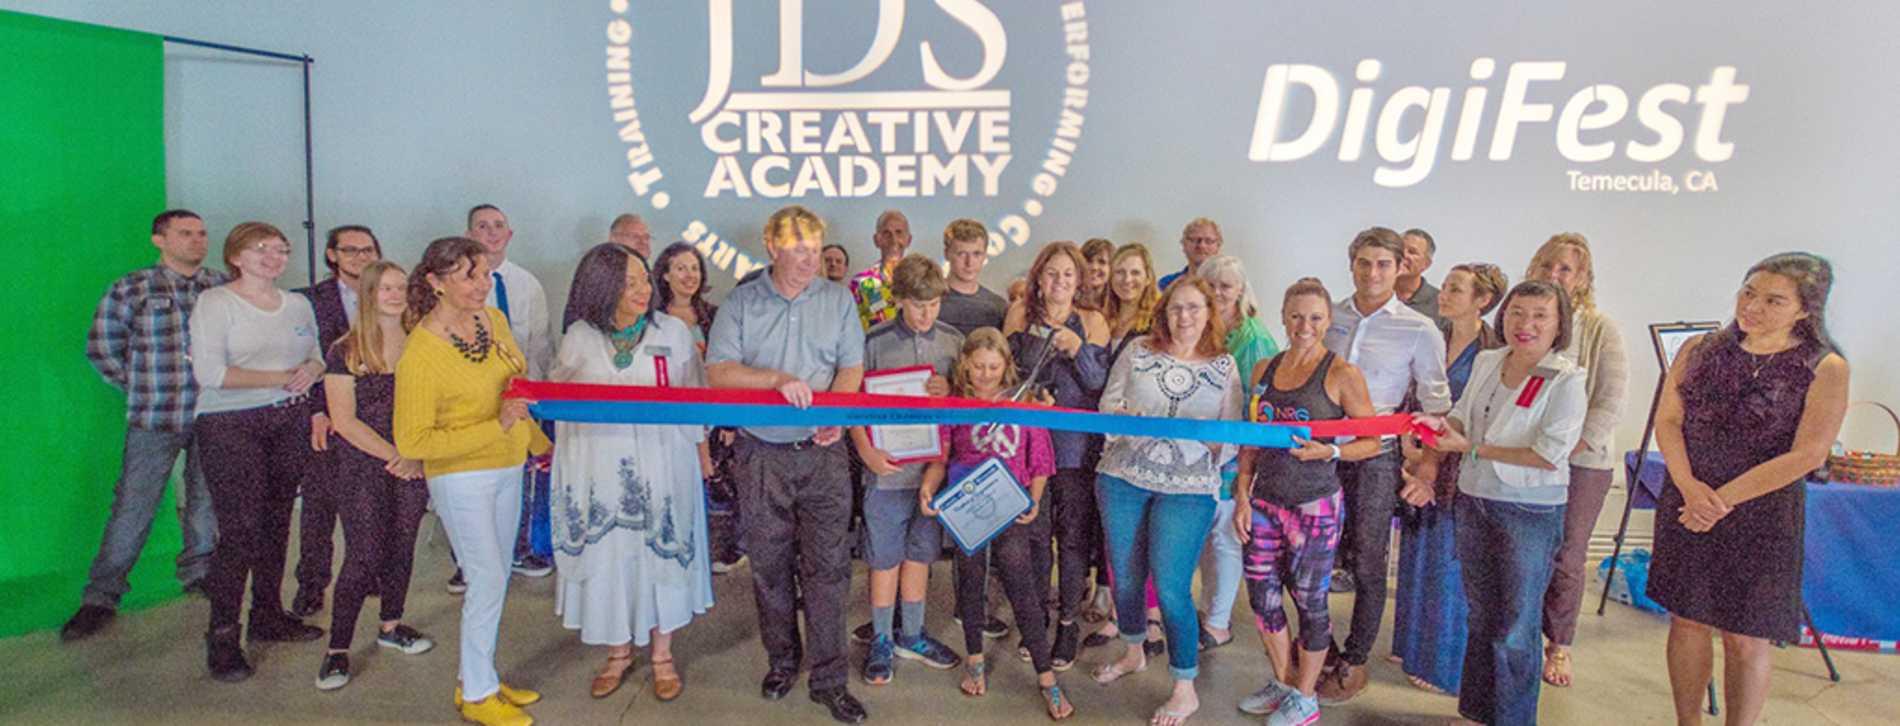 JDS Creative Academy Image